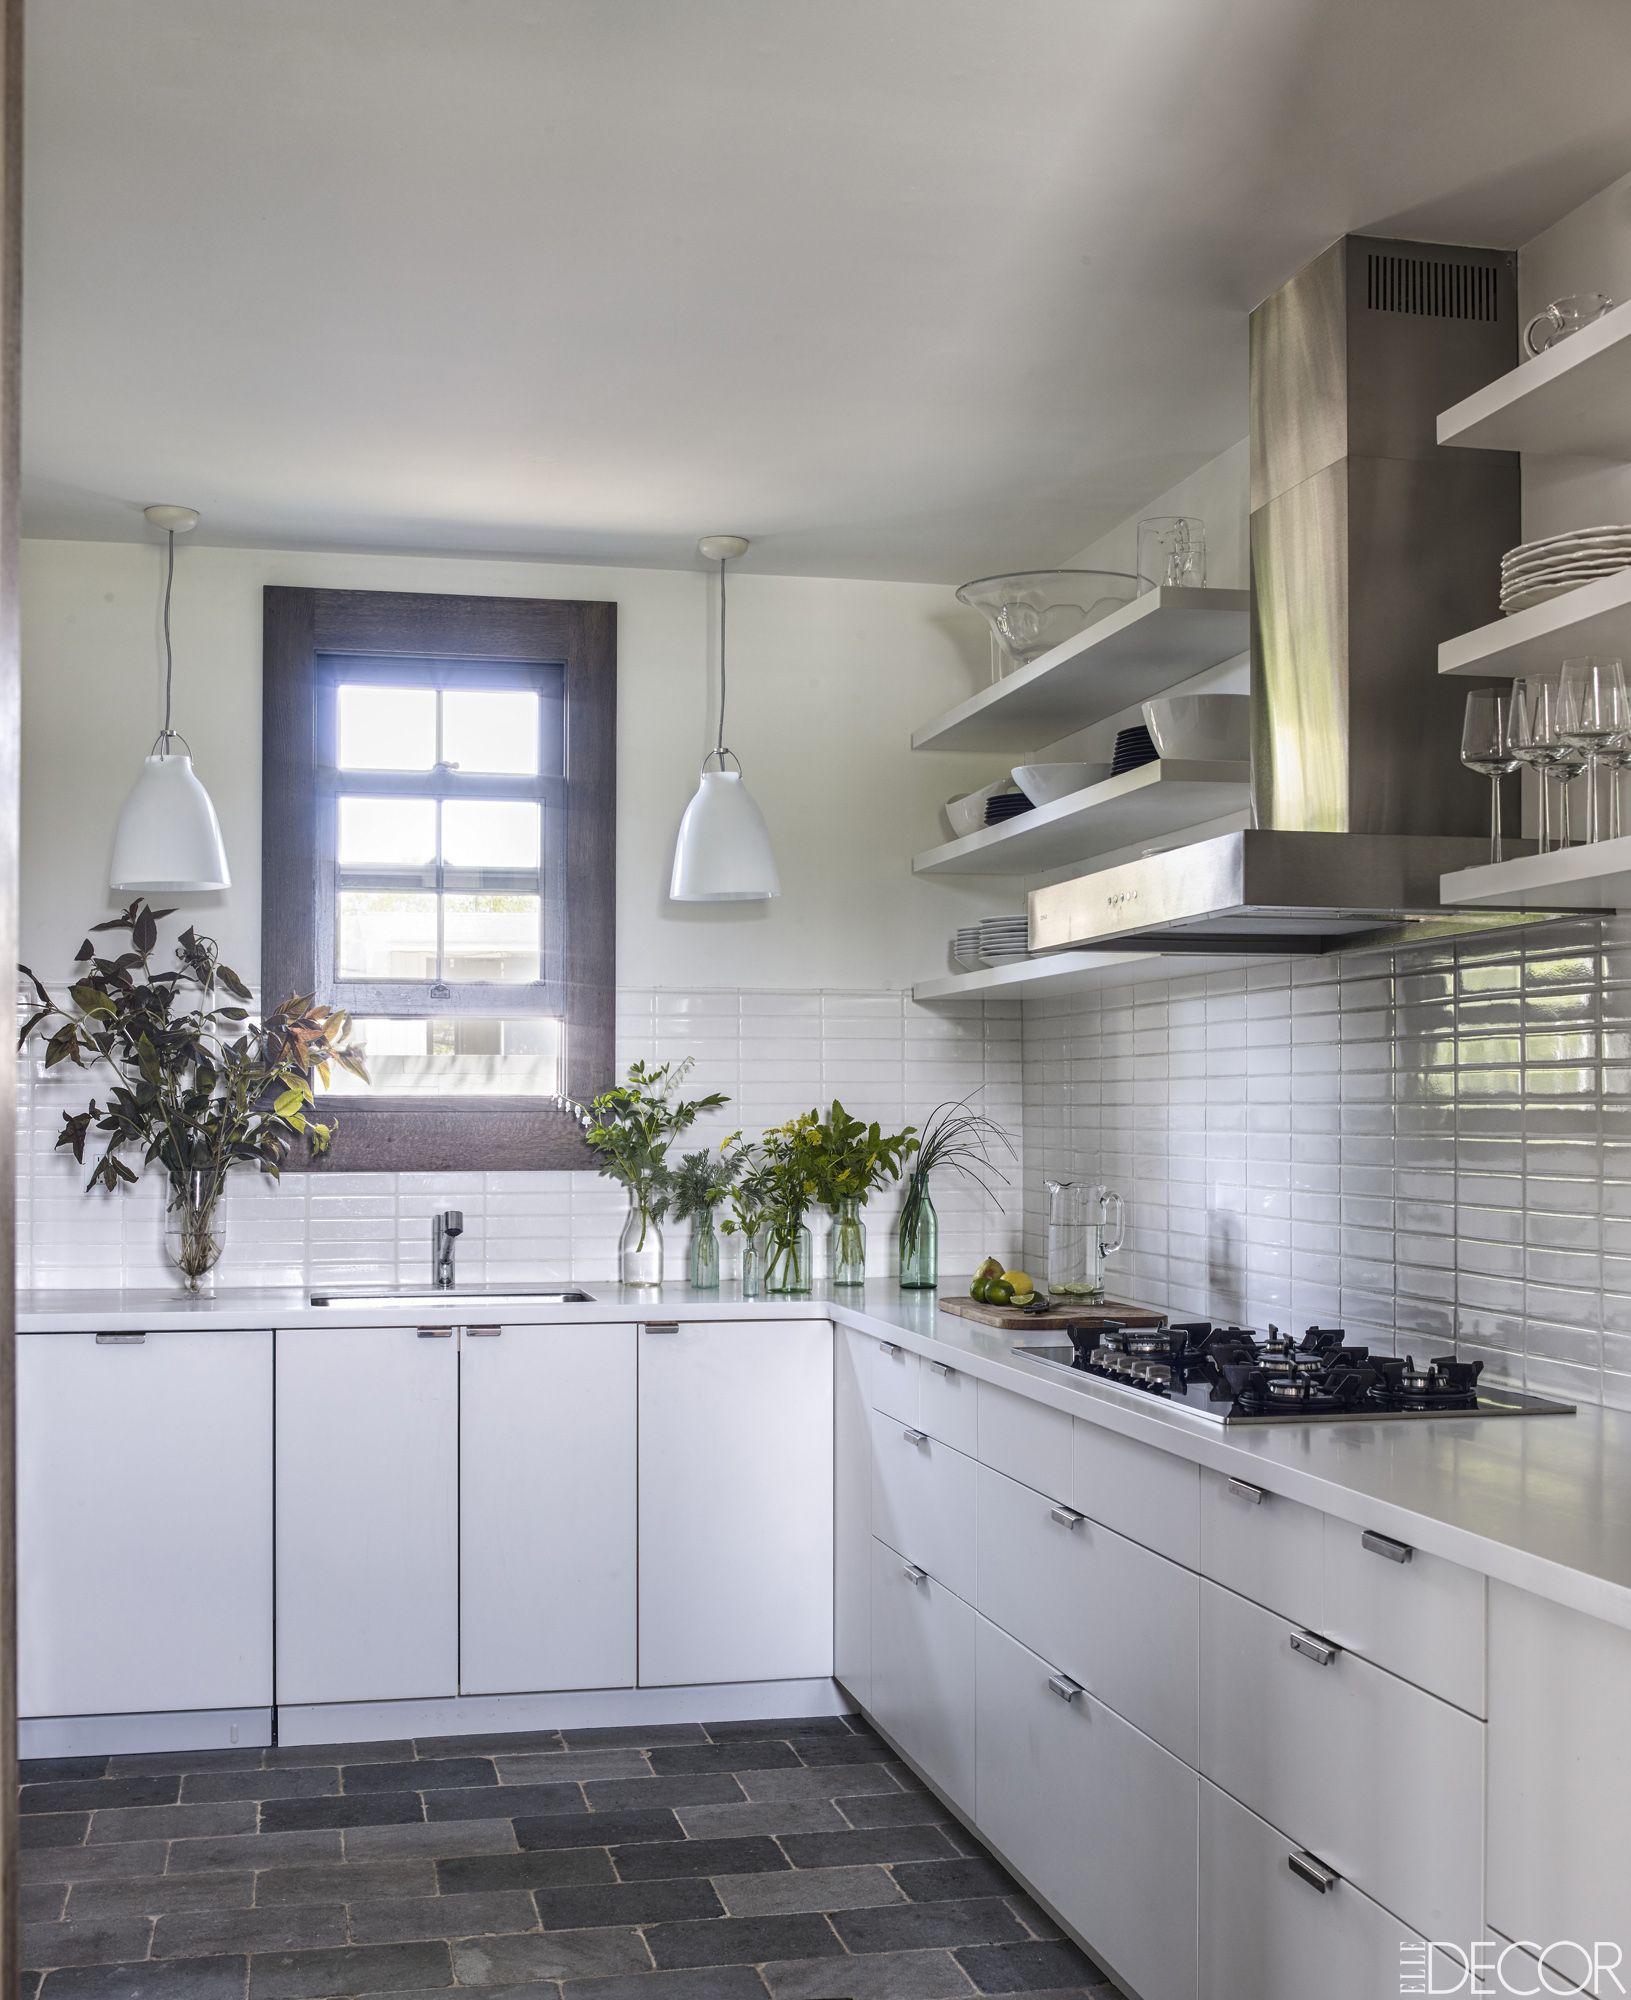 25 Minimalist Kitchen Design Ideas Pictures Of Minimalism Styled